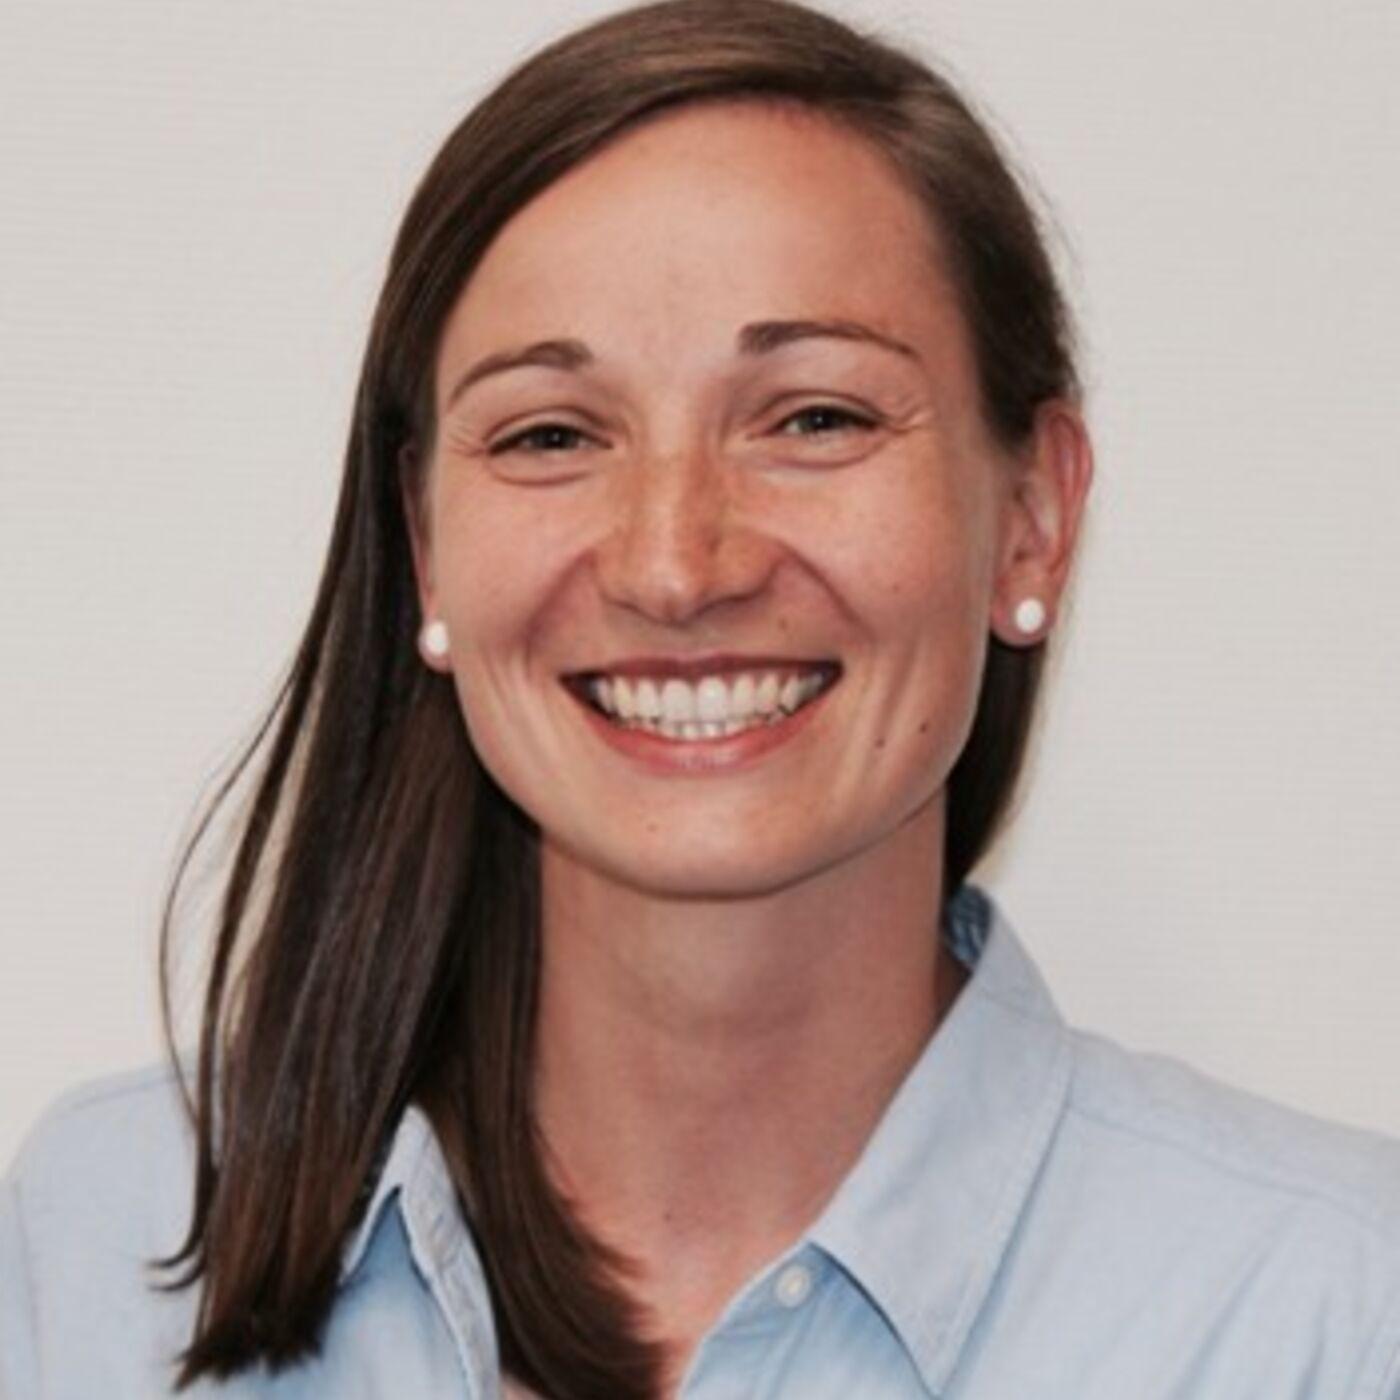 Which is Better? Short-term pleasures or long-term goals? Dr. Katharina Bernecker (Episode #139)